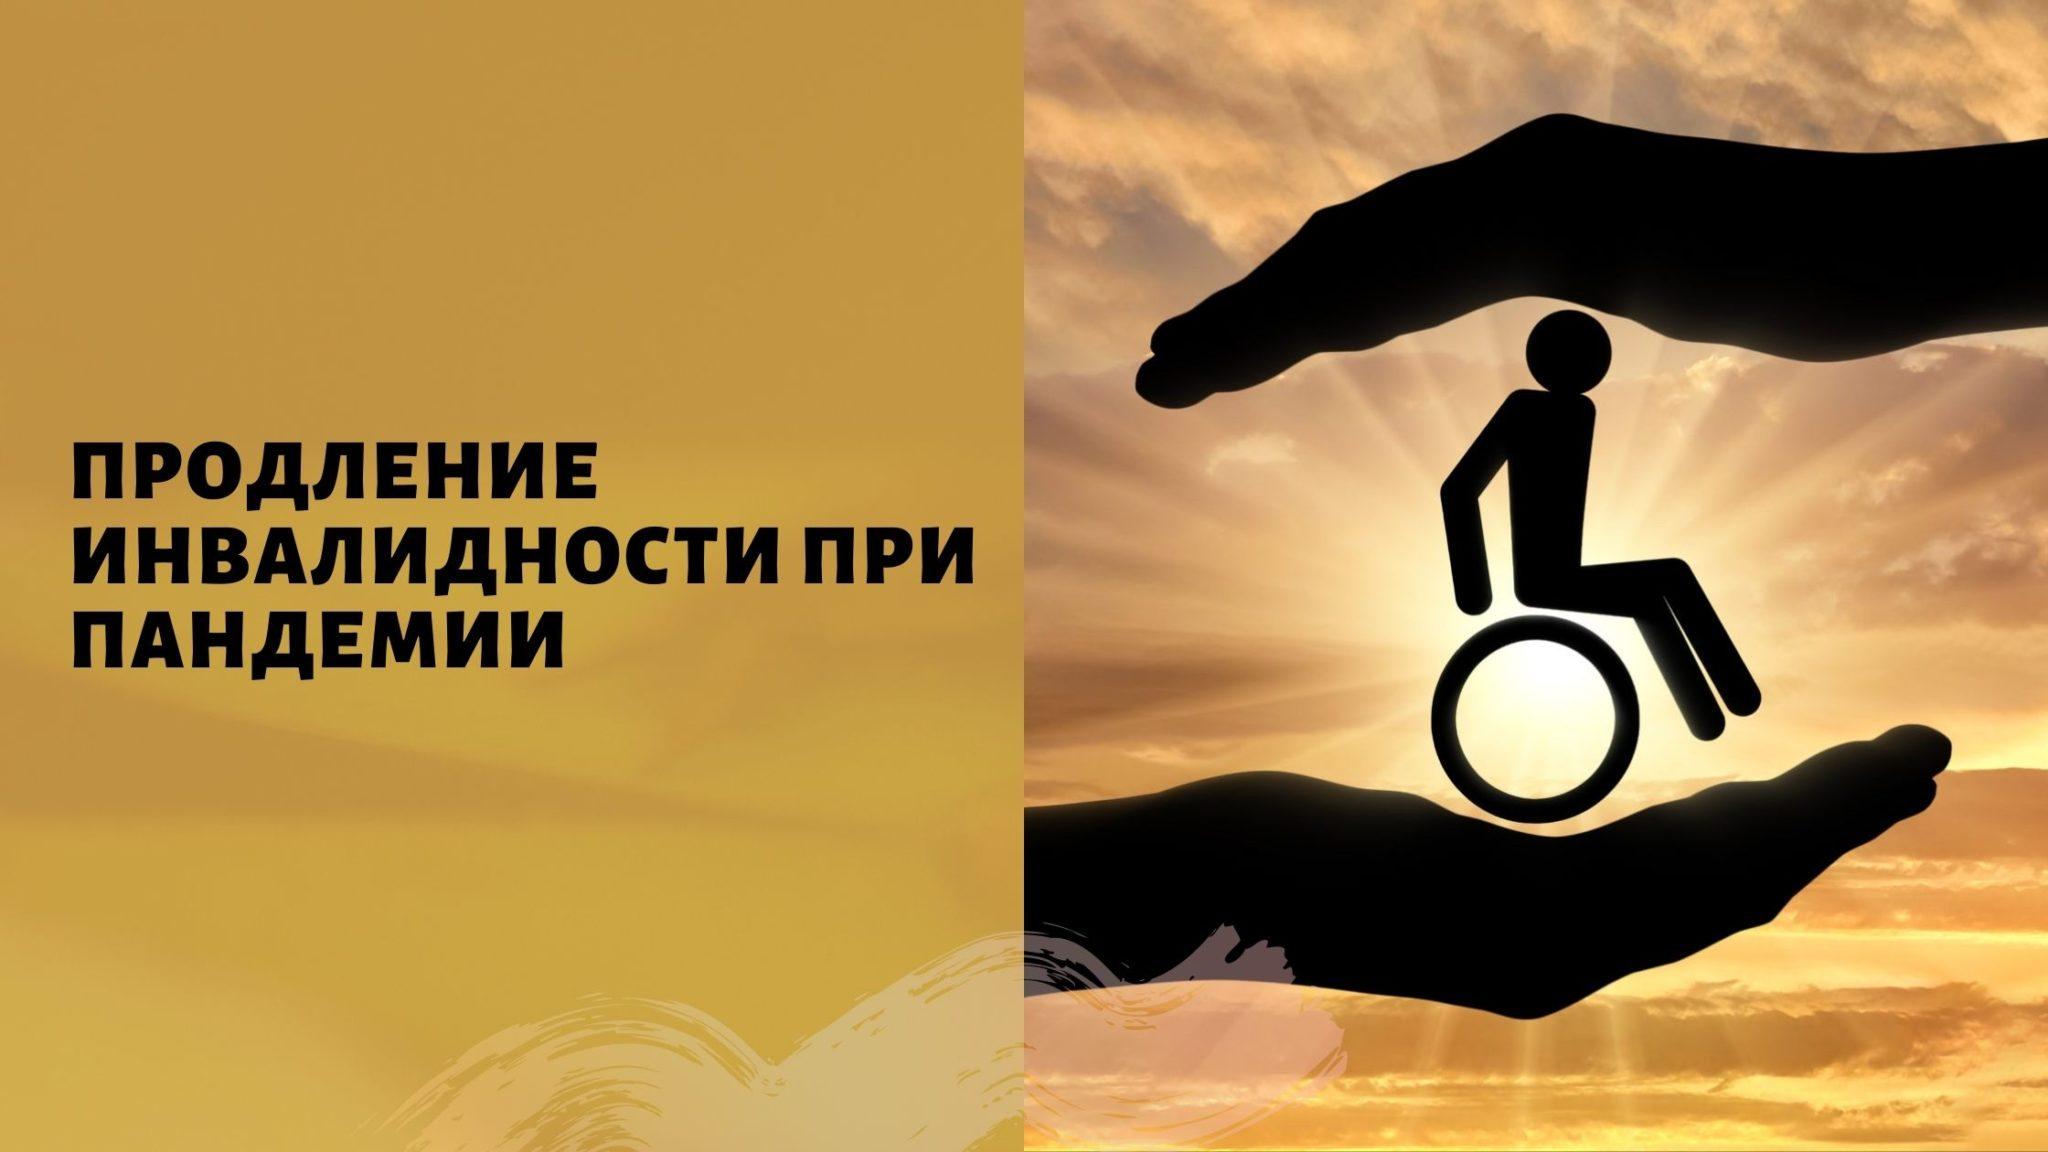 продление инвалидности при ковид